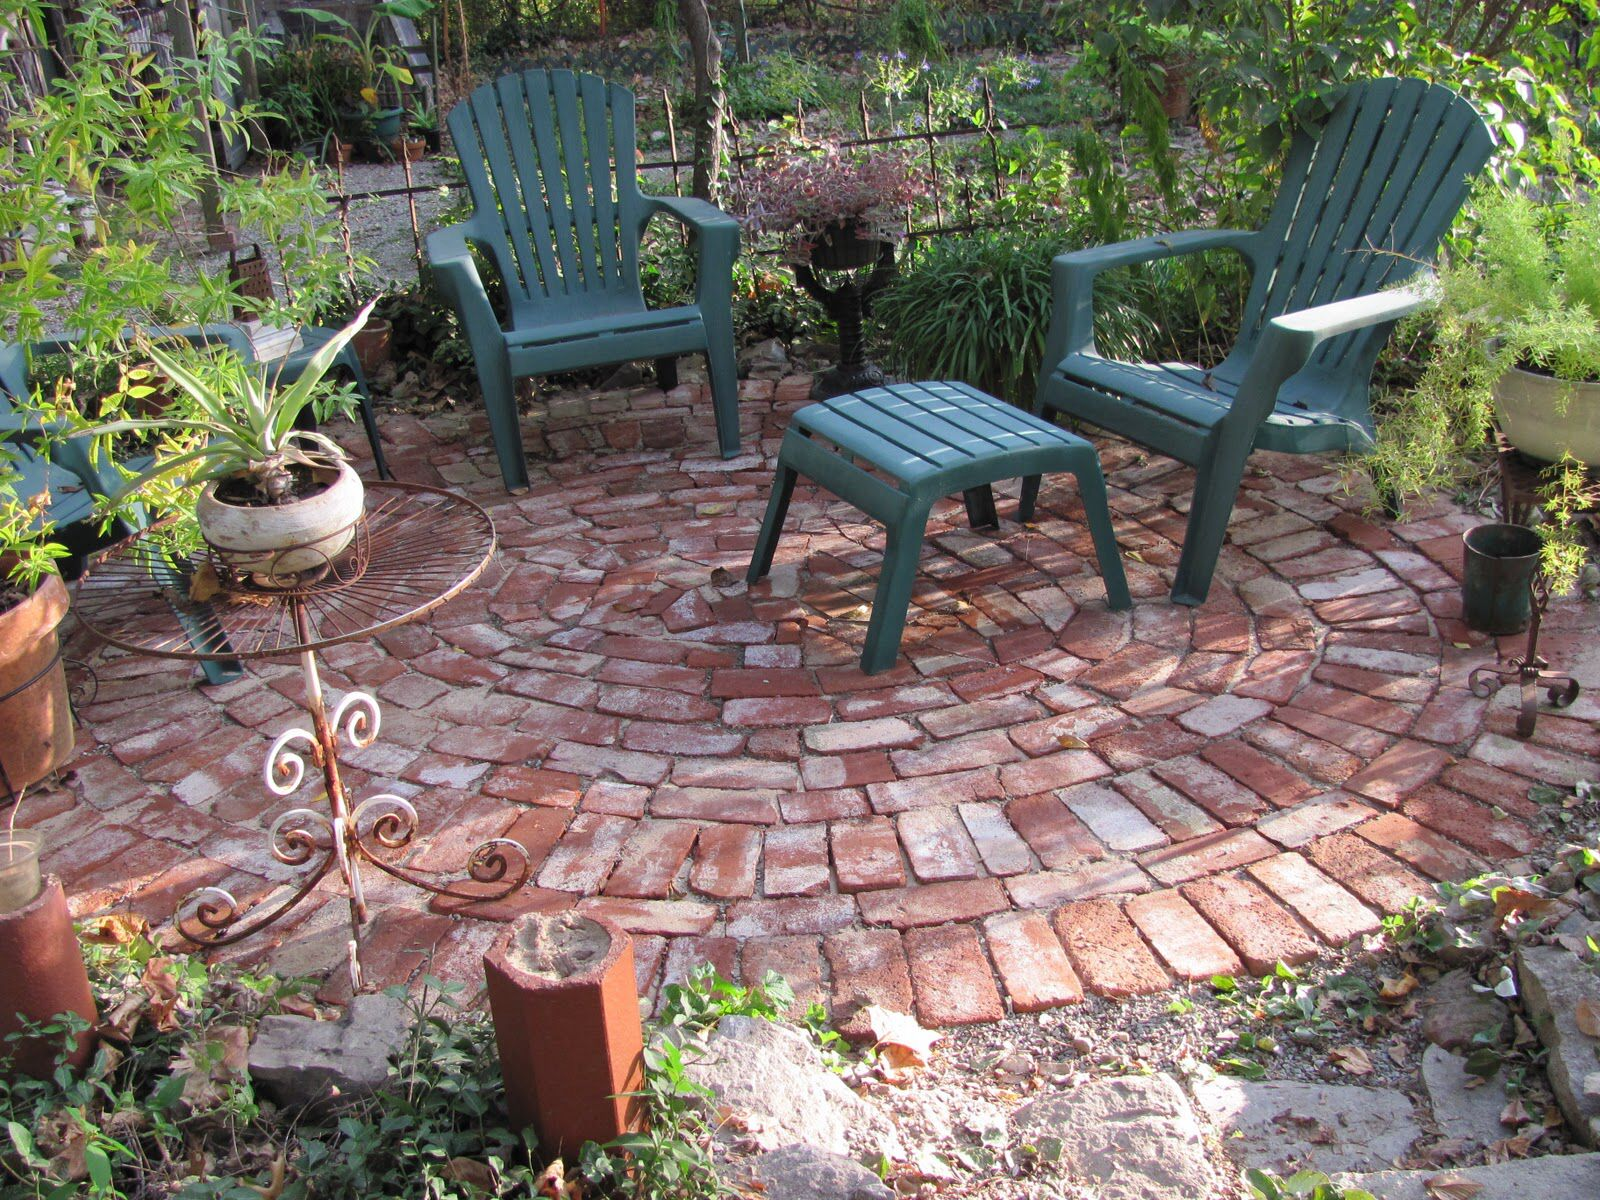 Round Broken Bricks Backyard Brick Patterns Patio Rustic